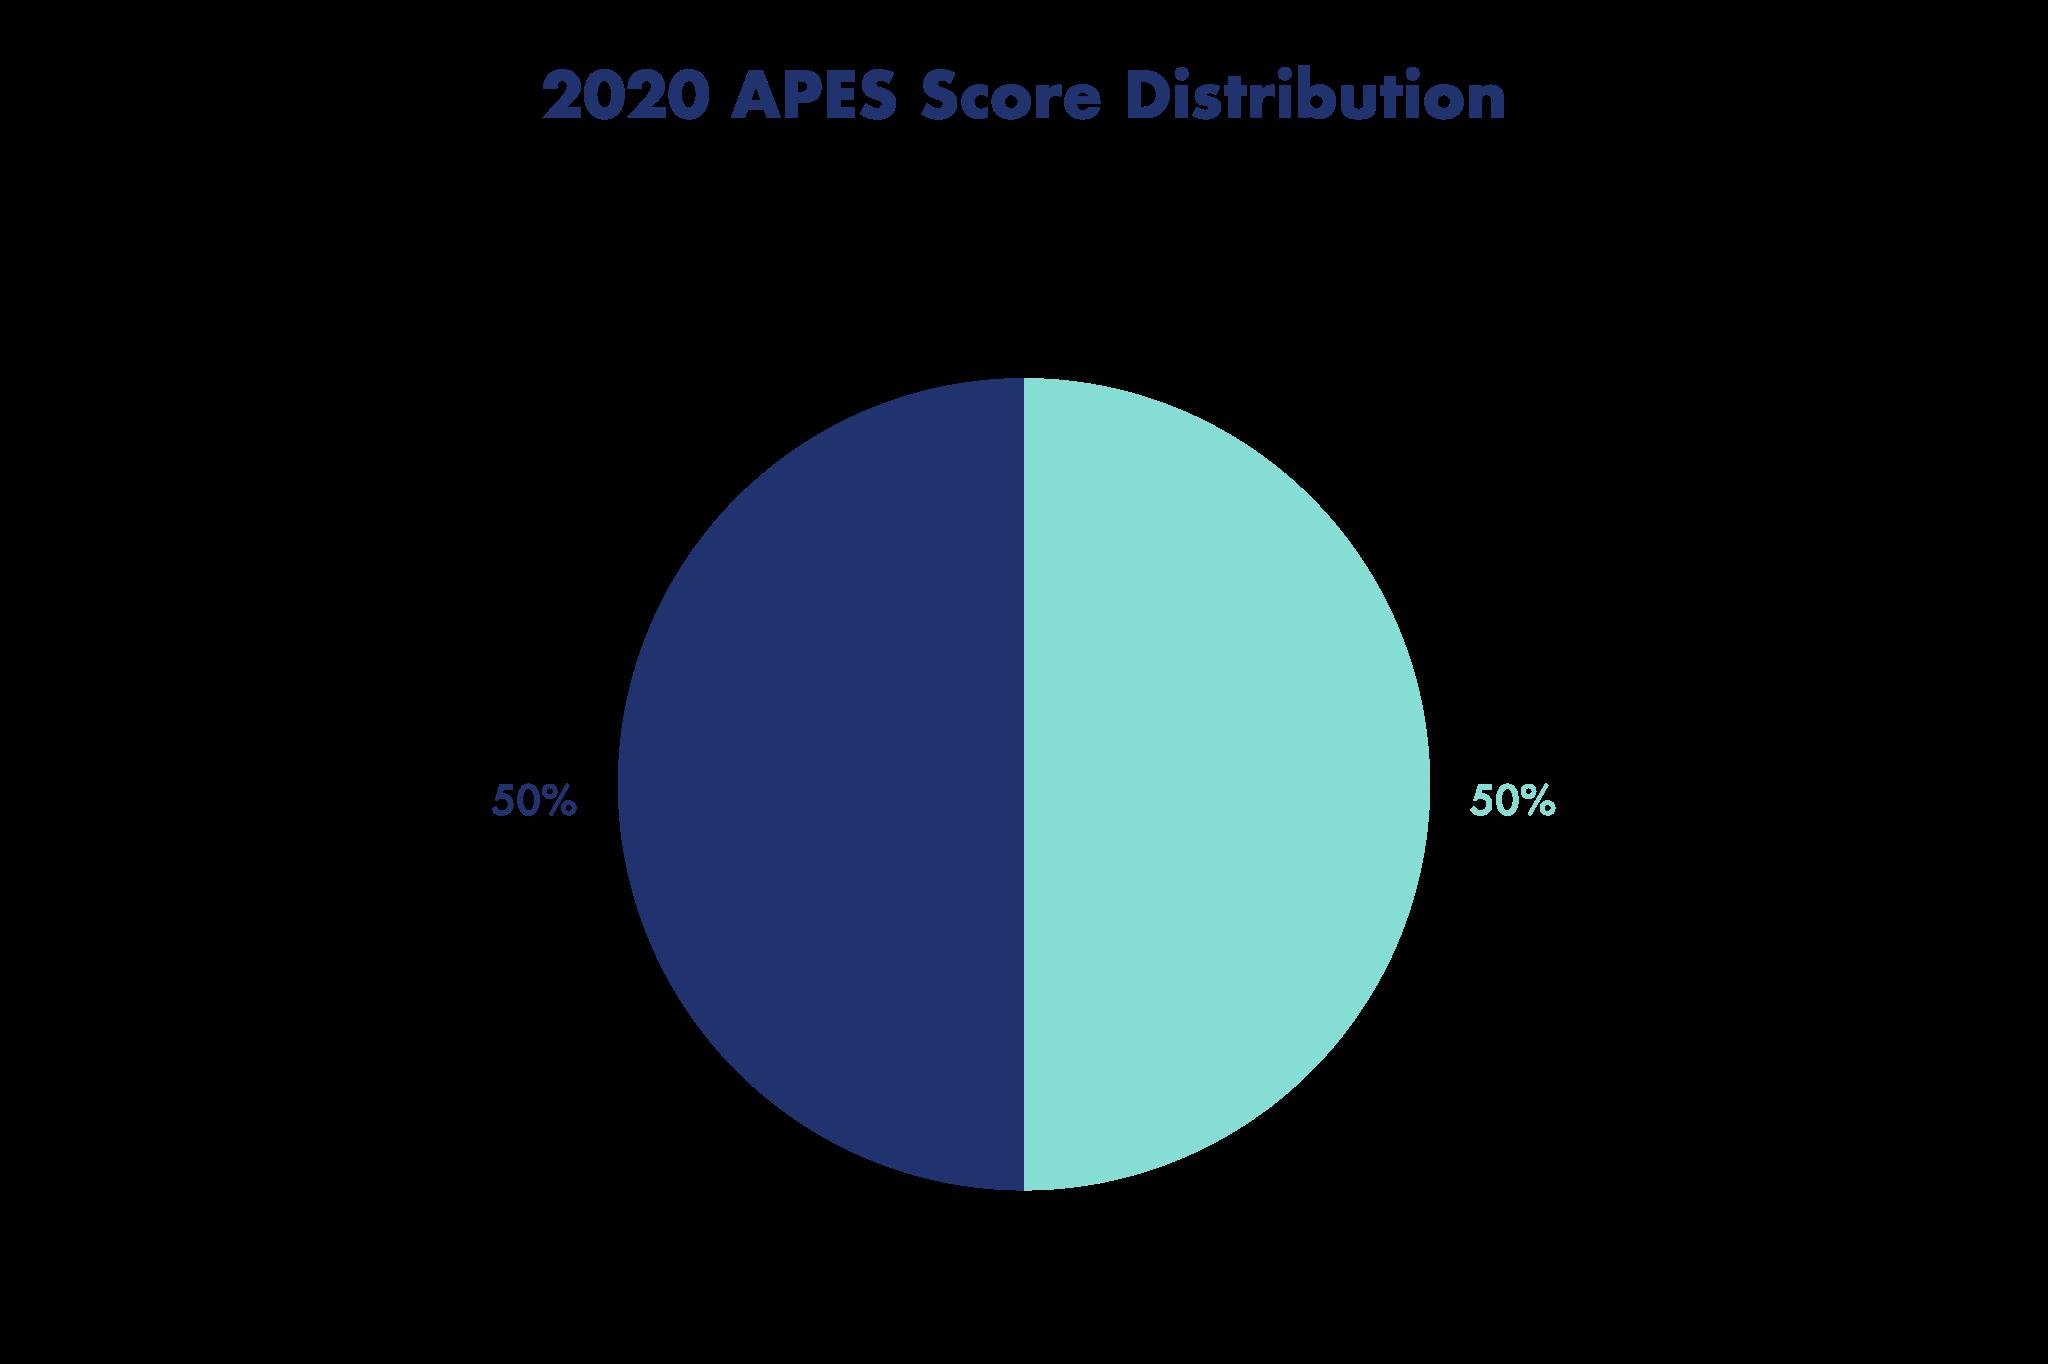 2020 APES Score Distribution